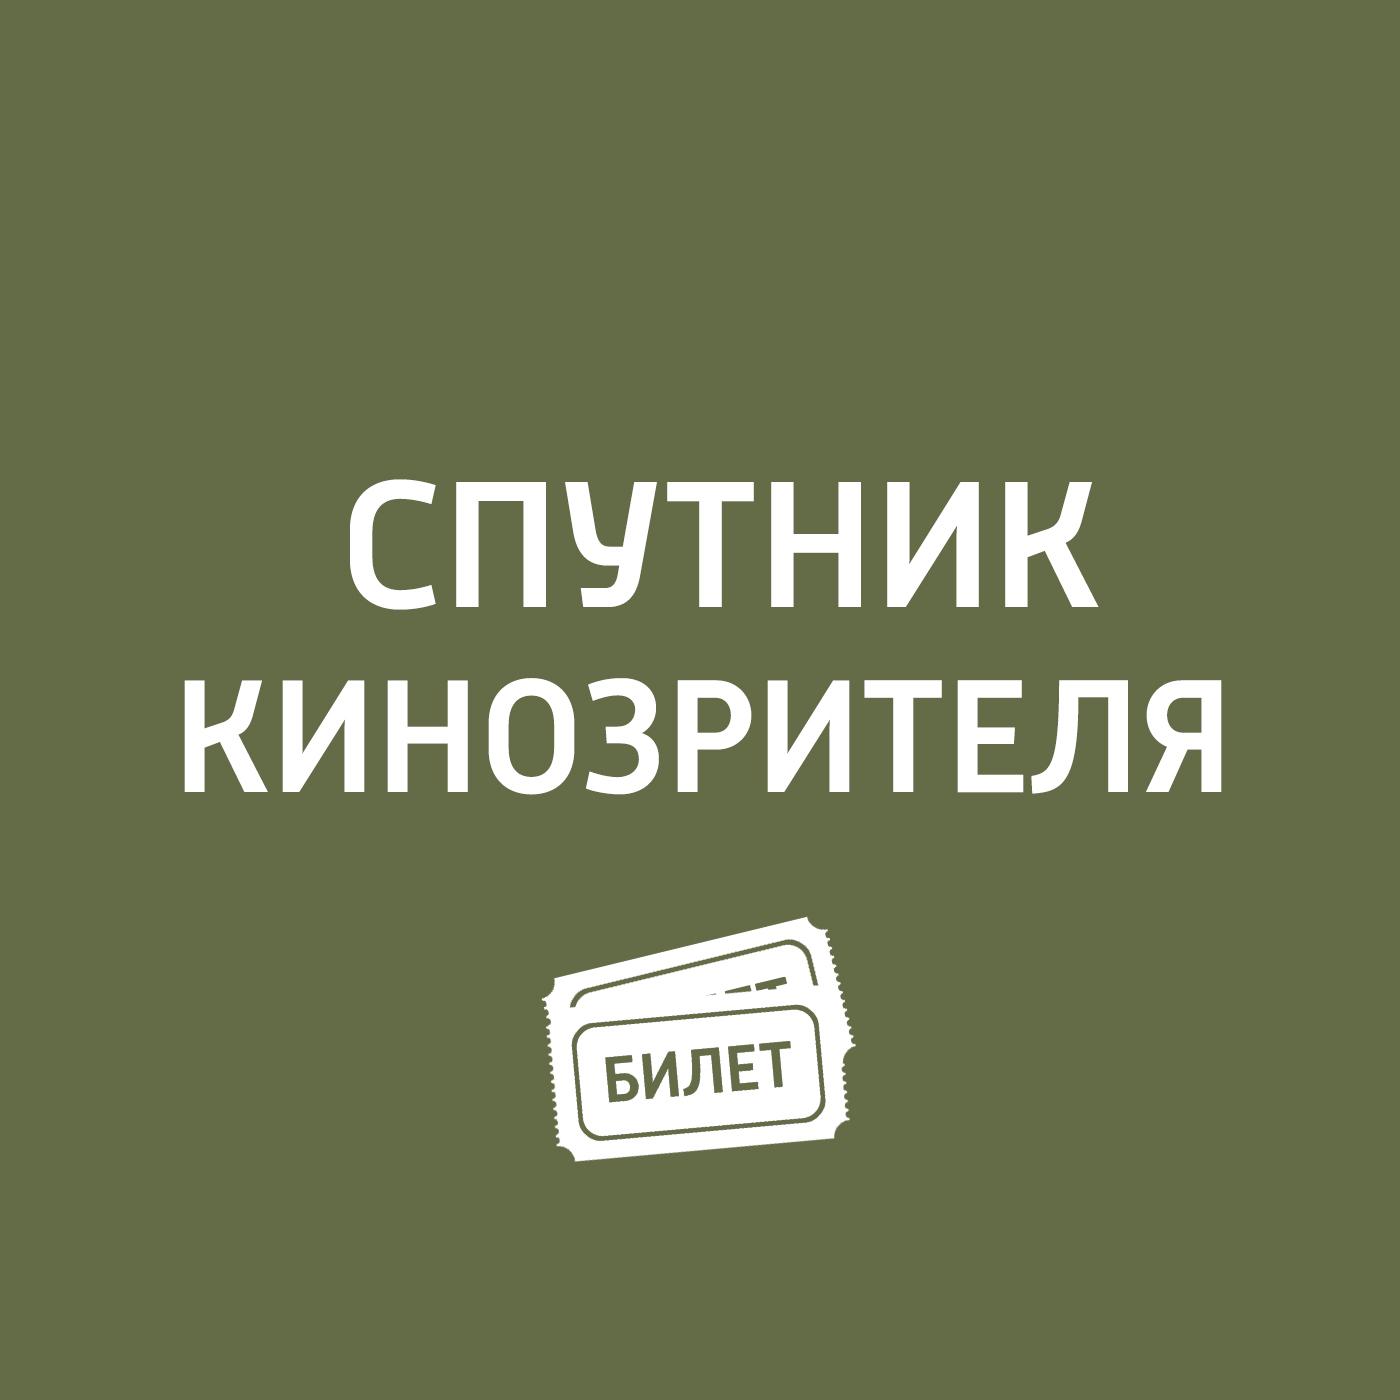 Антон Долин 12 лет рабства, «Хоббит: Пустошь Смауга и др. антон долин бригада наследник джунгли и др